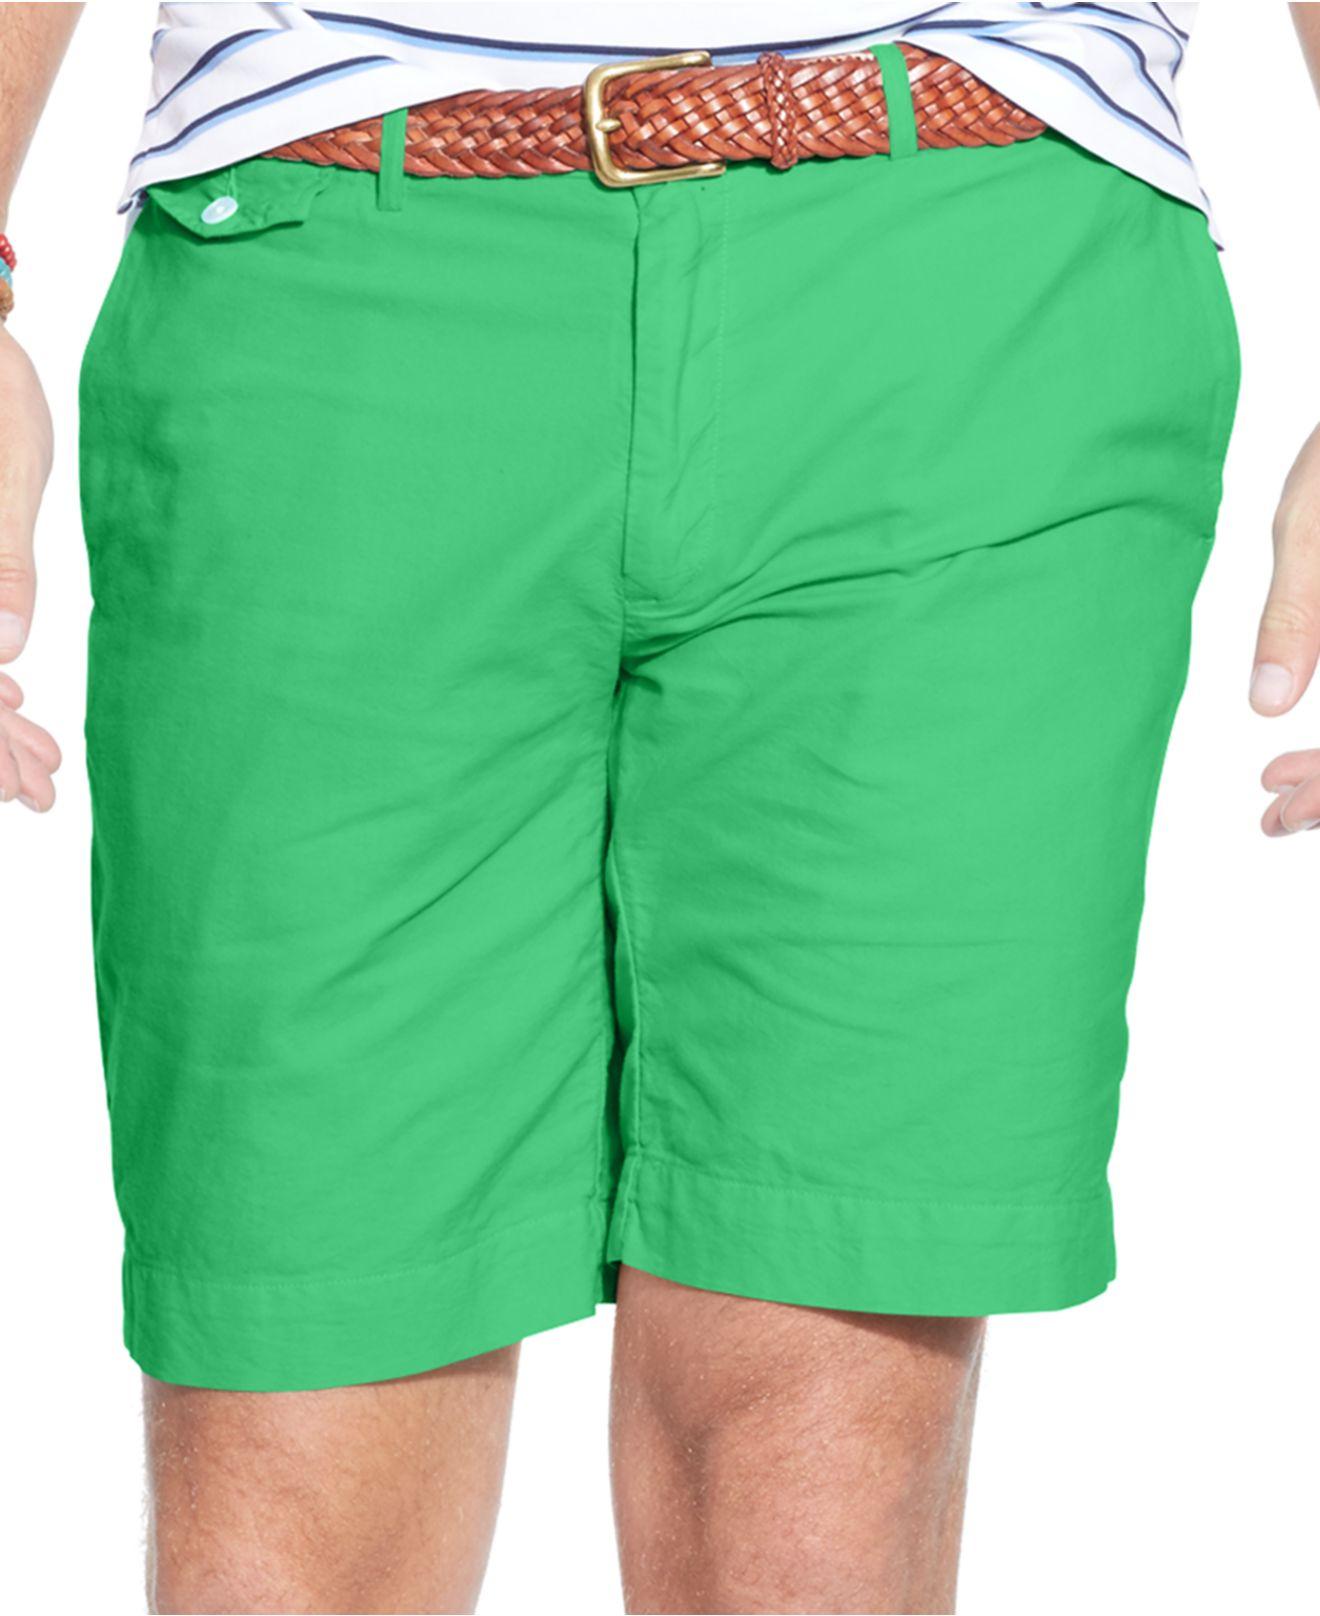 Shop men's big & tall cargo shorts on sale at Eddie Bauer, a legend in American sportswear. Explore our latest selection of big & tall cargo shorts for men. % satisfaction guaranteed since